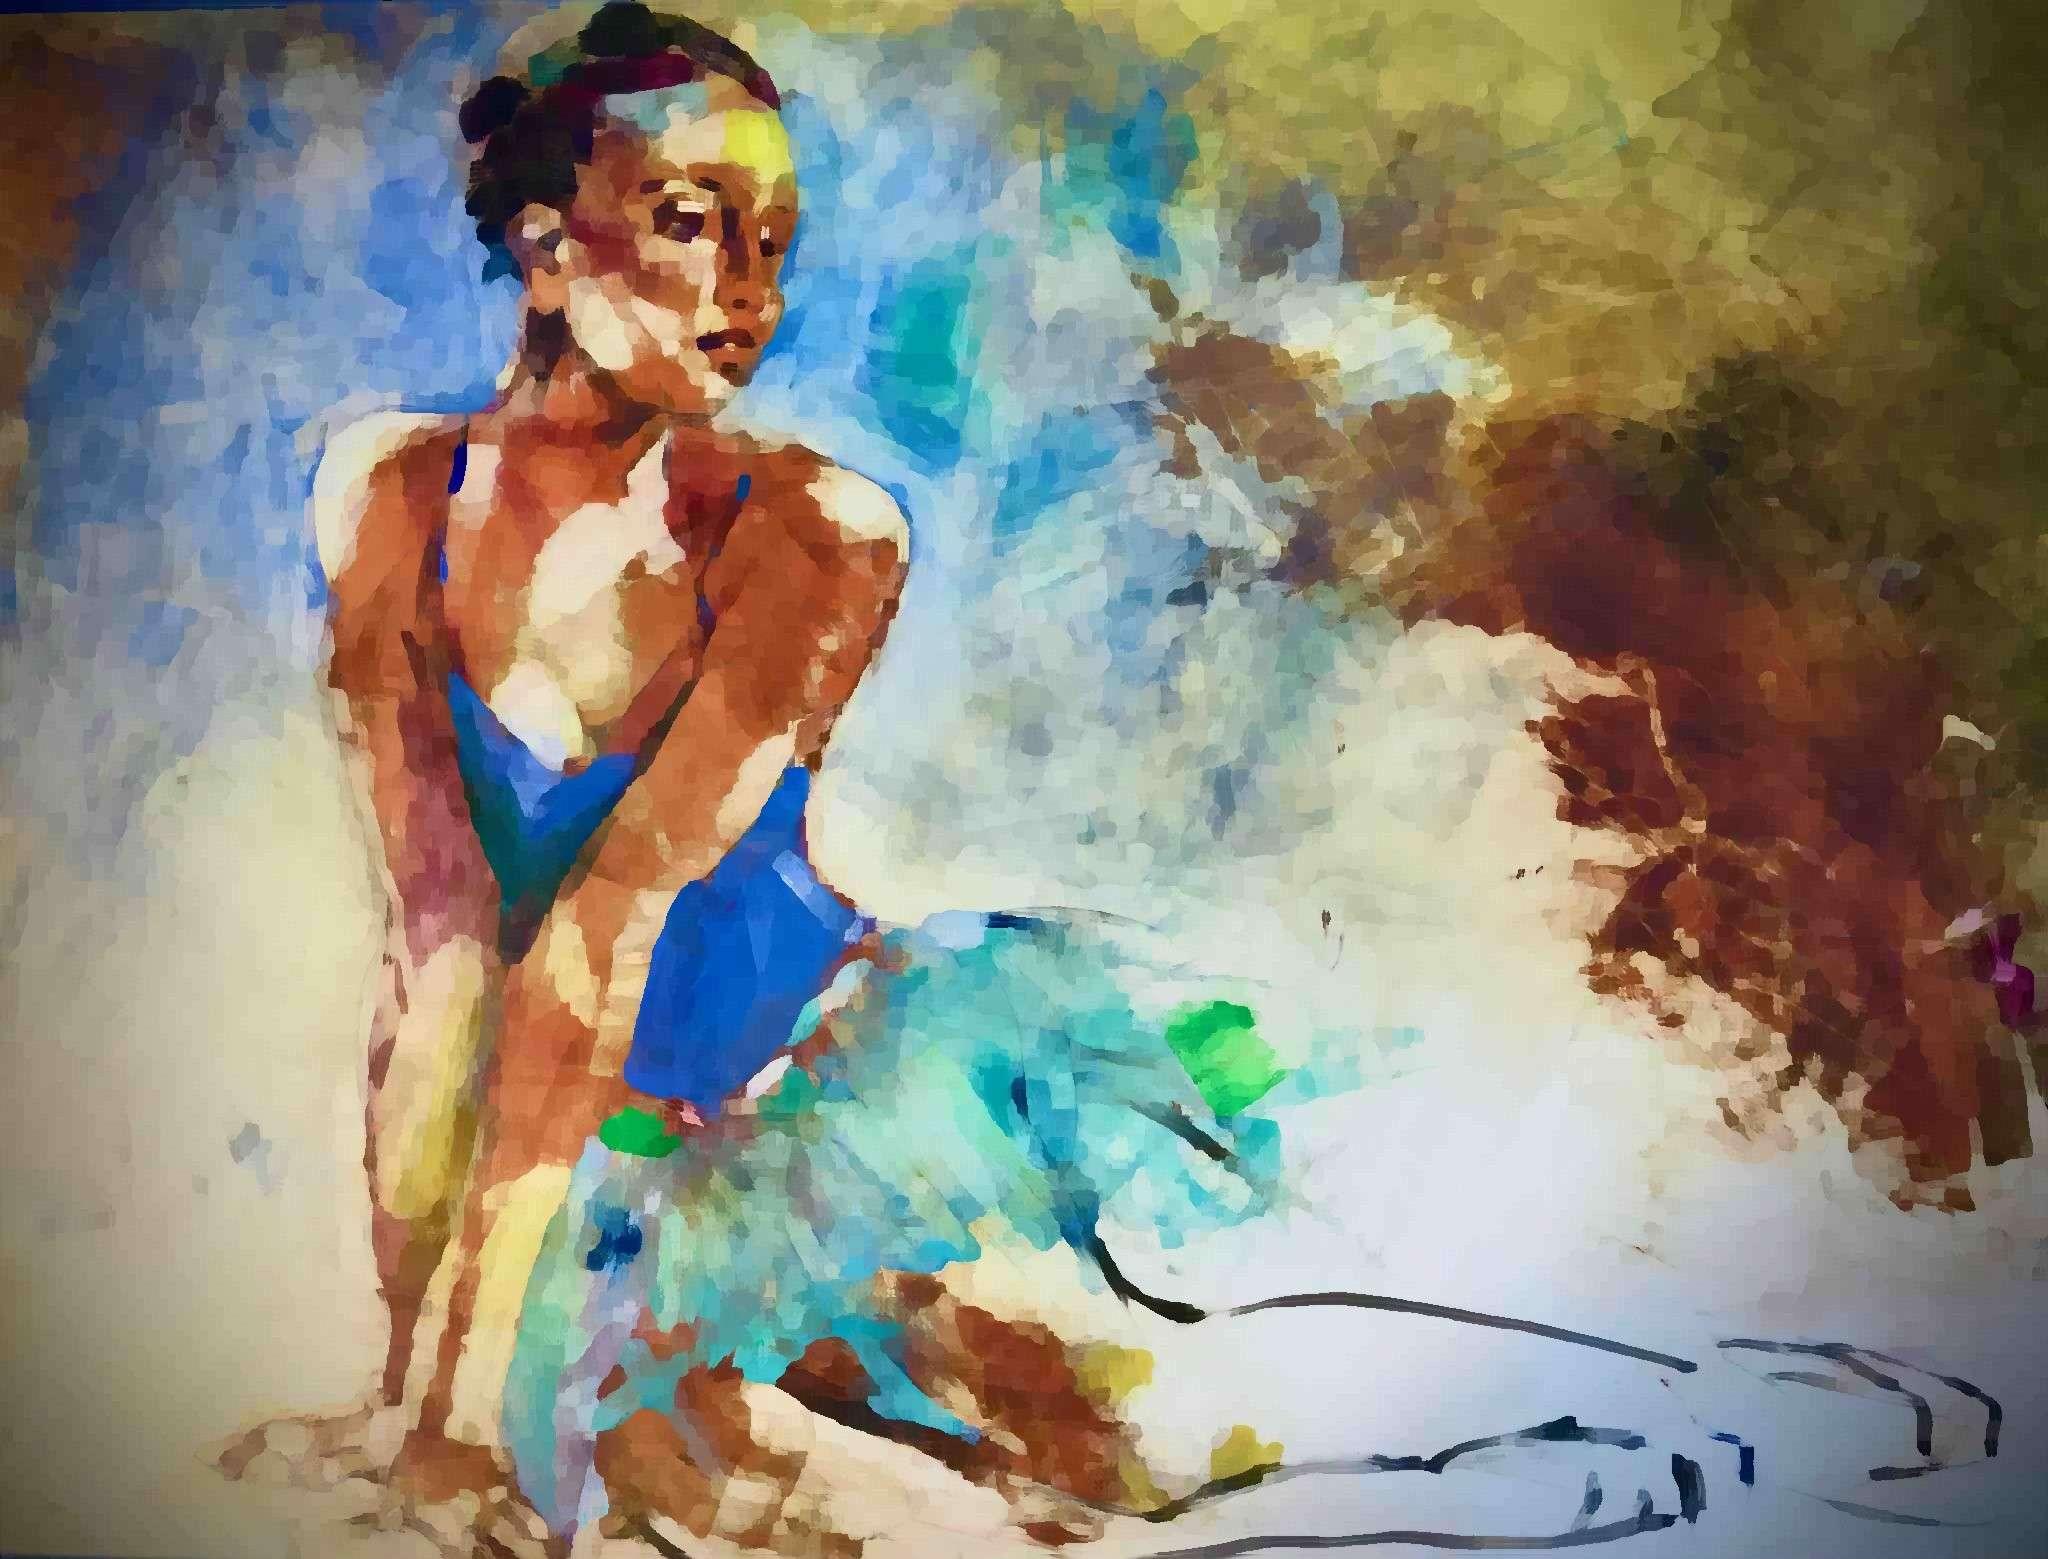 Ballerina in Watercolor - Nirmal Singh MD